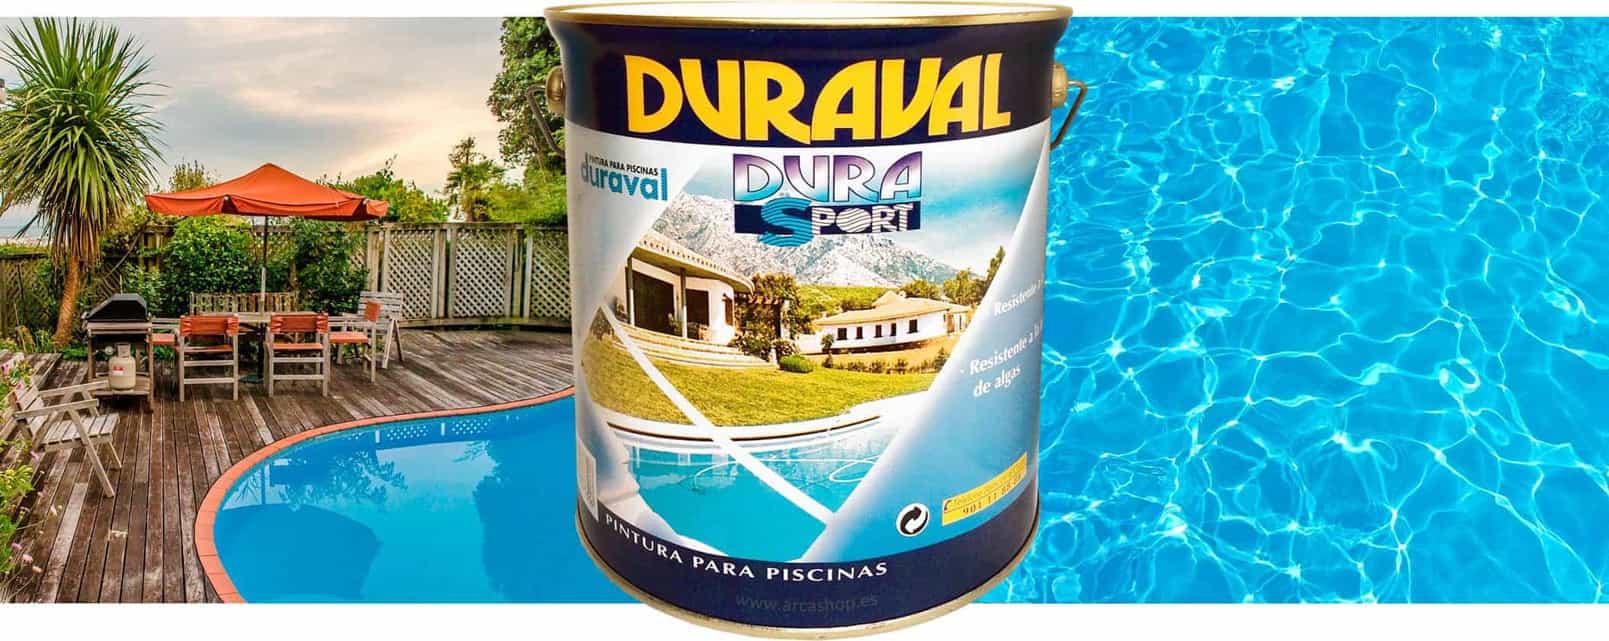 Pintura piscinas azul clorocaucho duraval durasport - Pintura para piscina ...